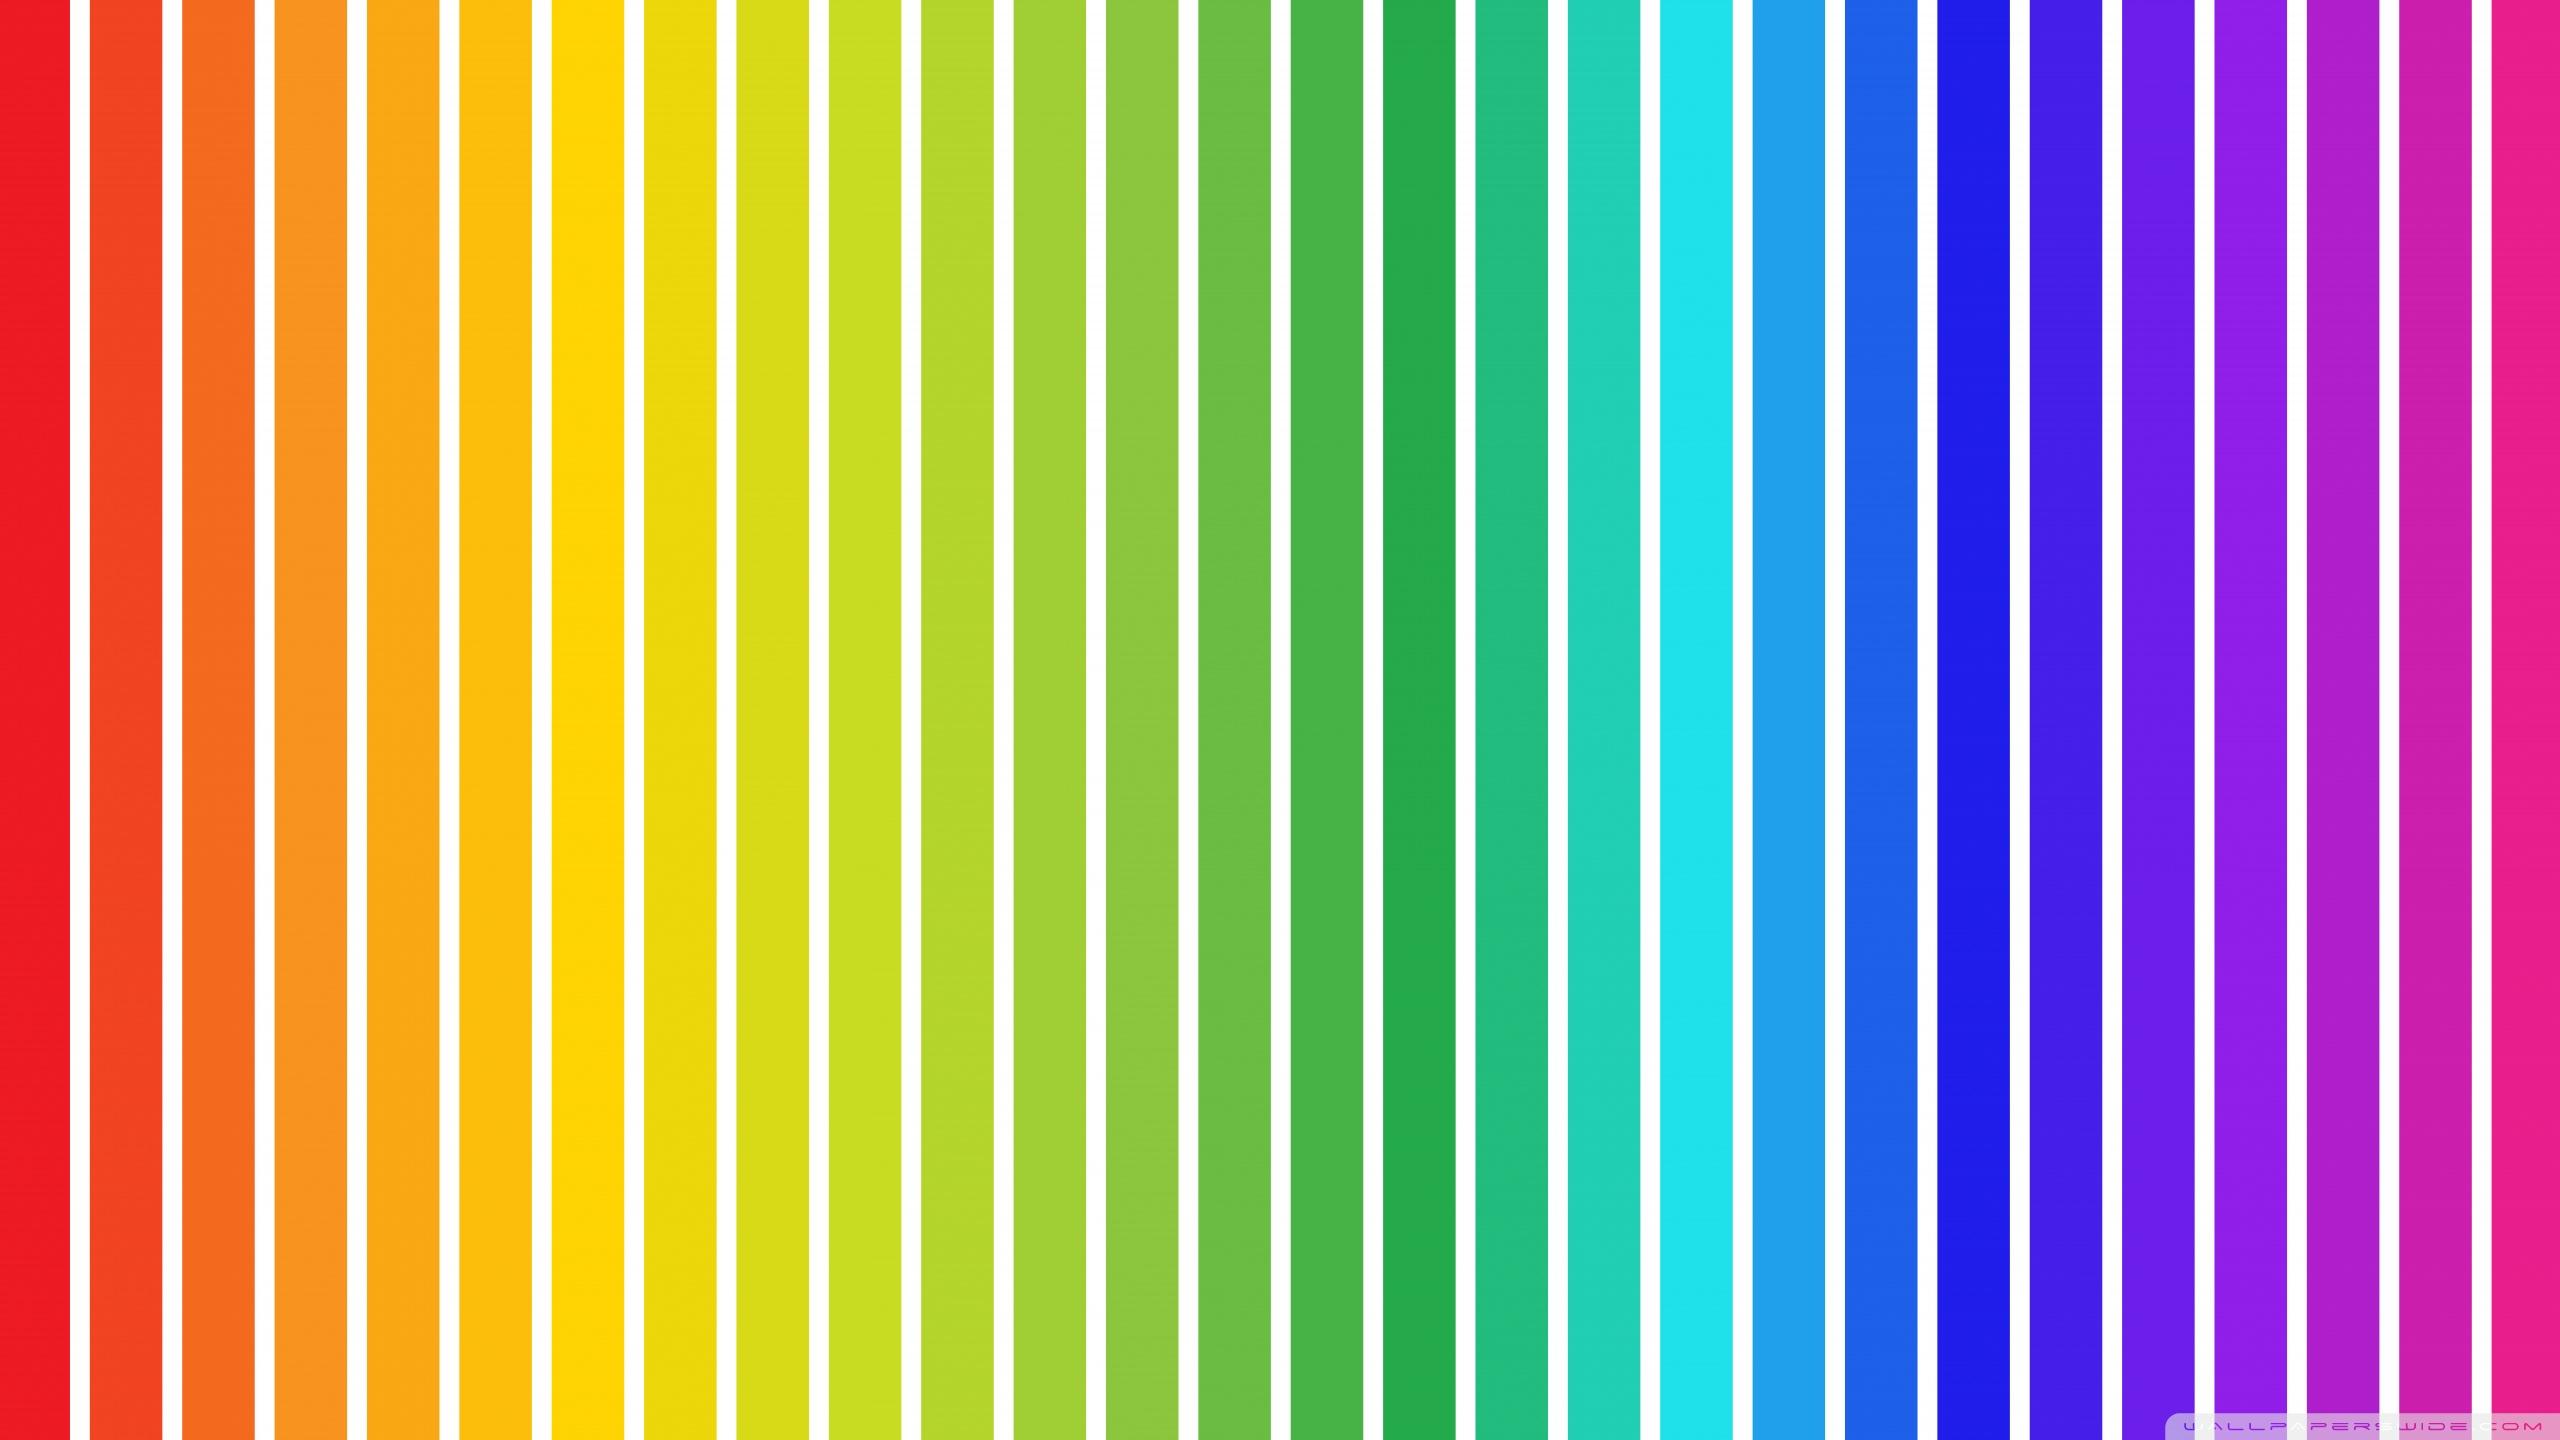 Simple Pubg Wallpaper Rainbow Background 4k Hd Desktop Wallpaper For